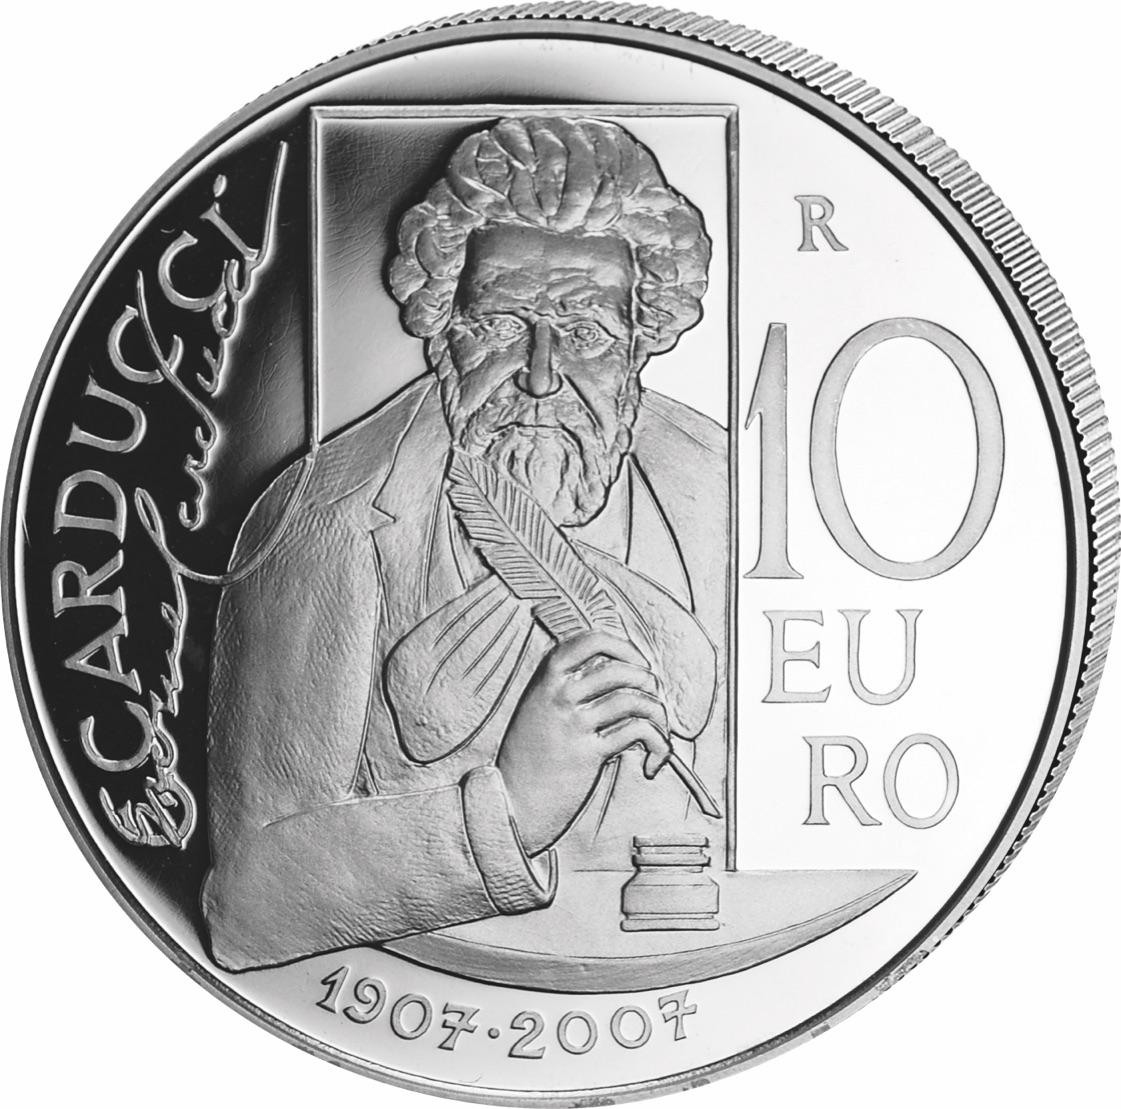 SM 10 Euro 2007 R